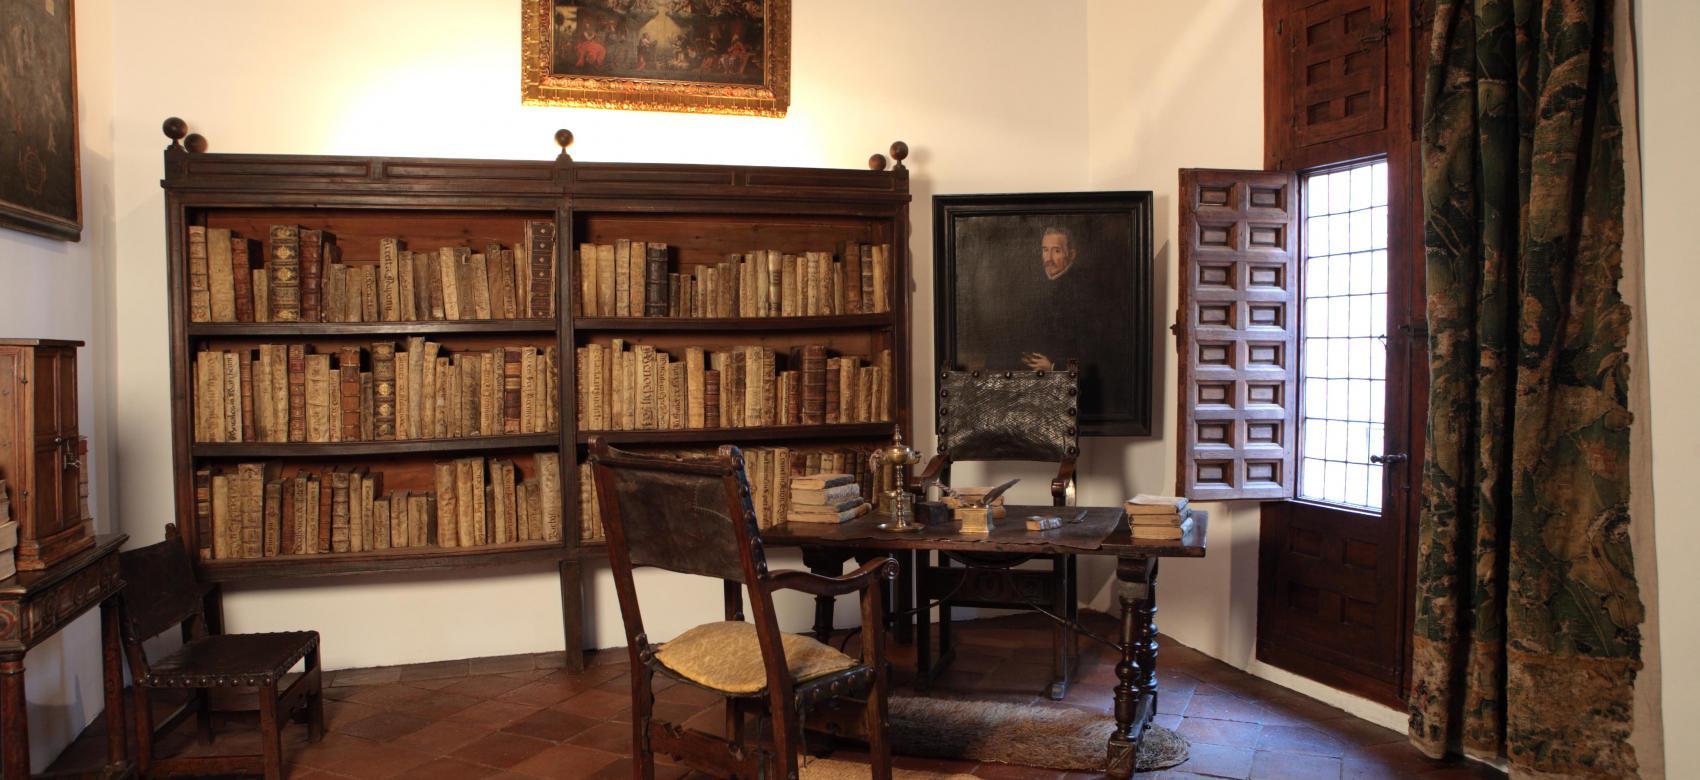 Estancia con librería Casa Museo Lope de Vega